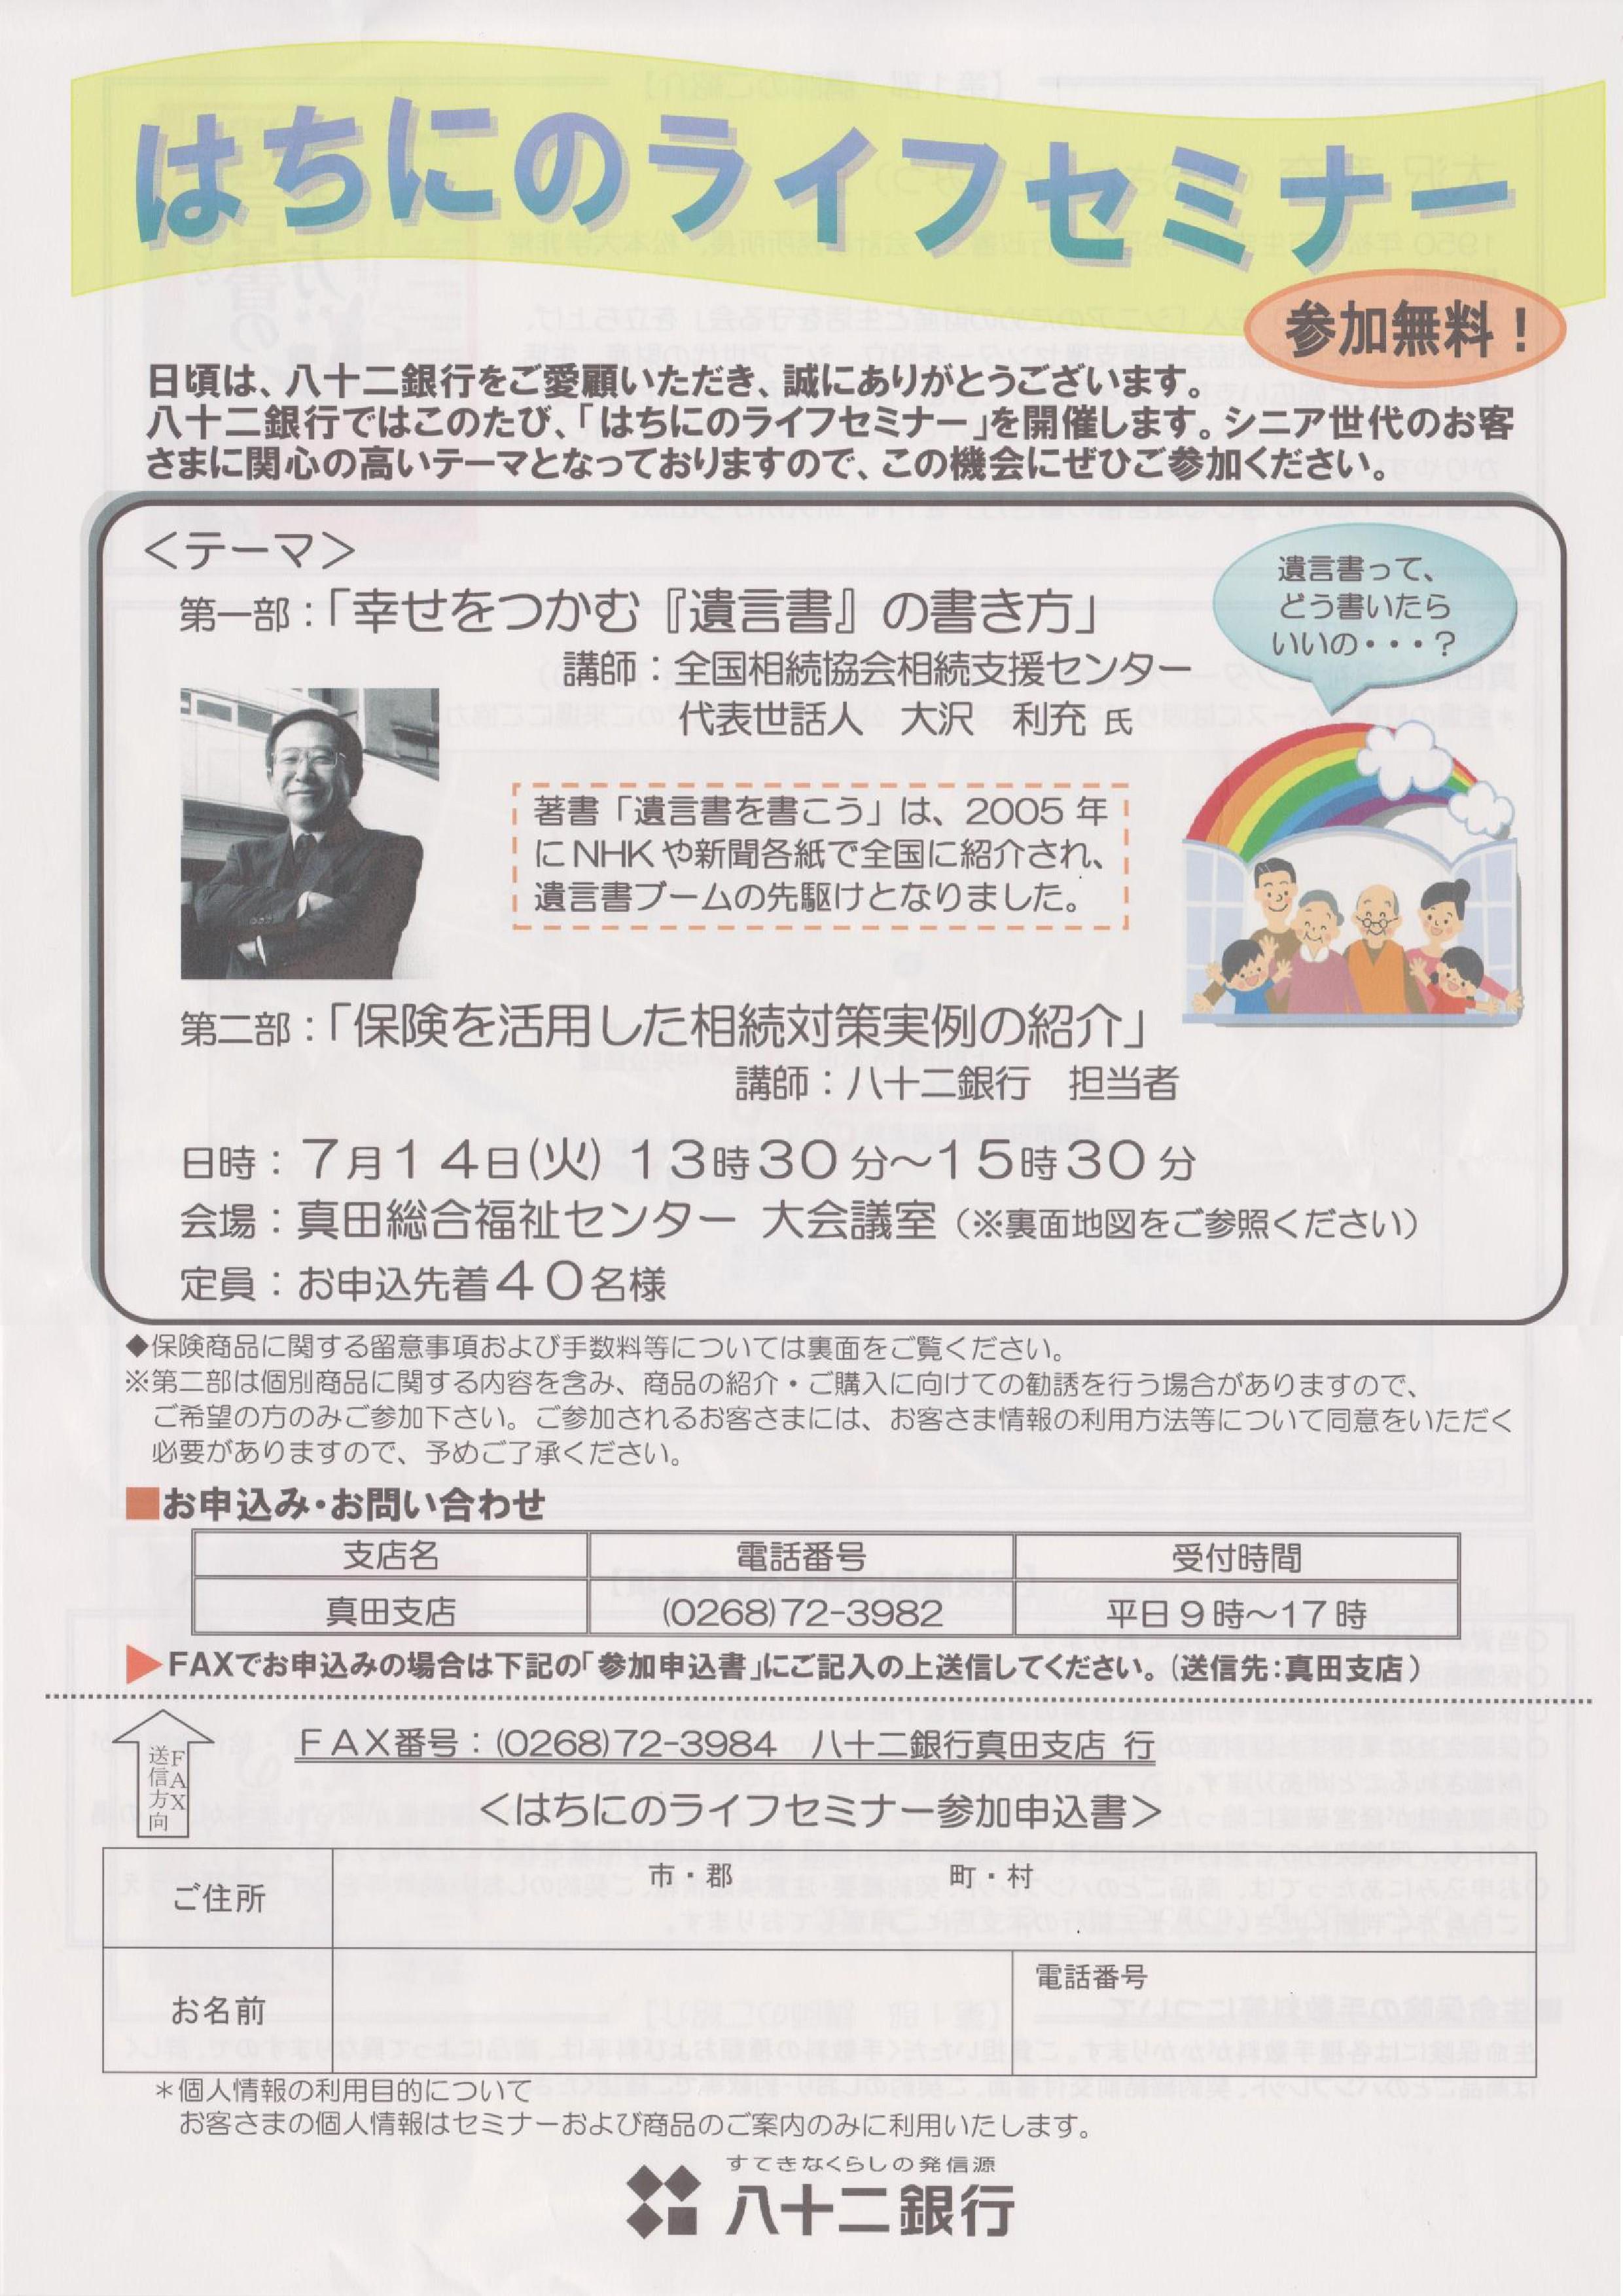 20150714八十二銀行セミナー真田支店_表面